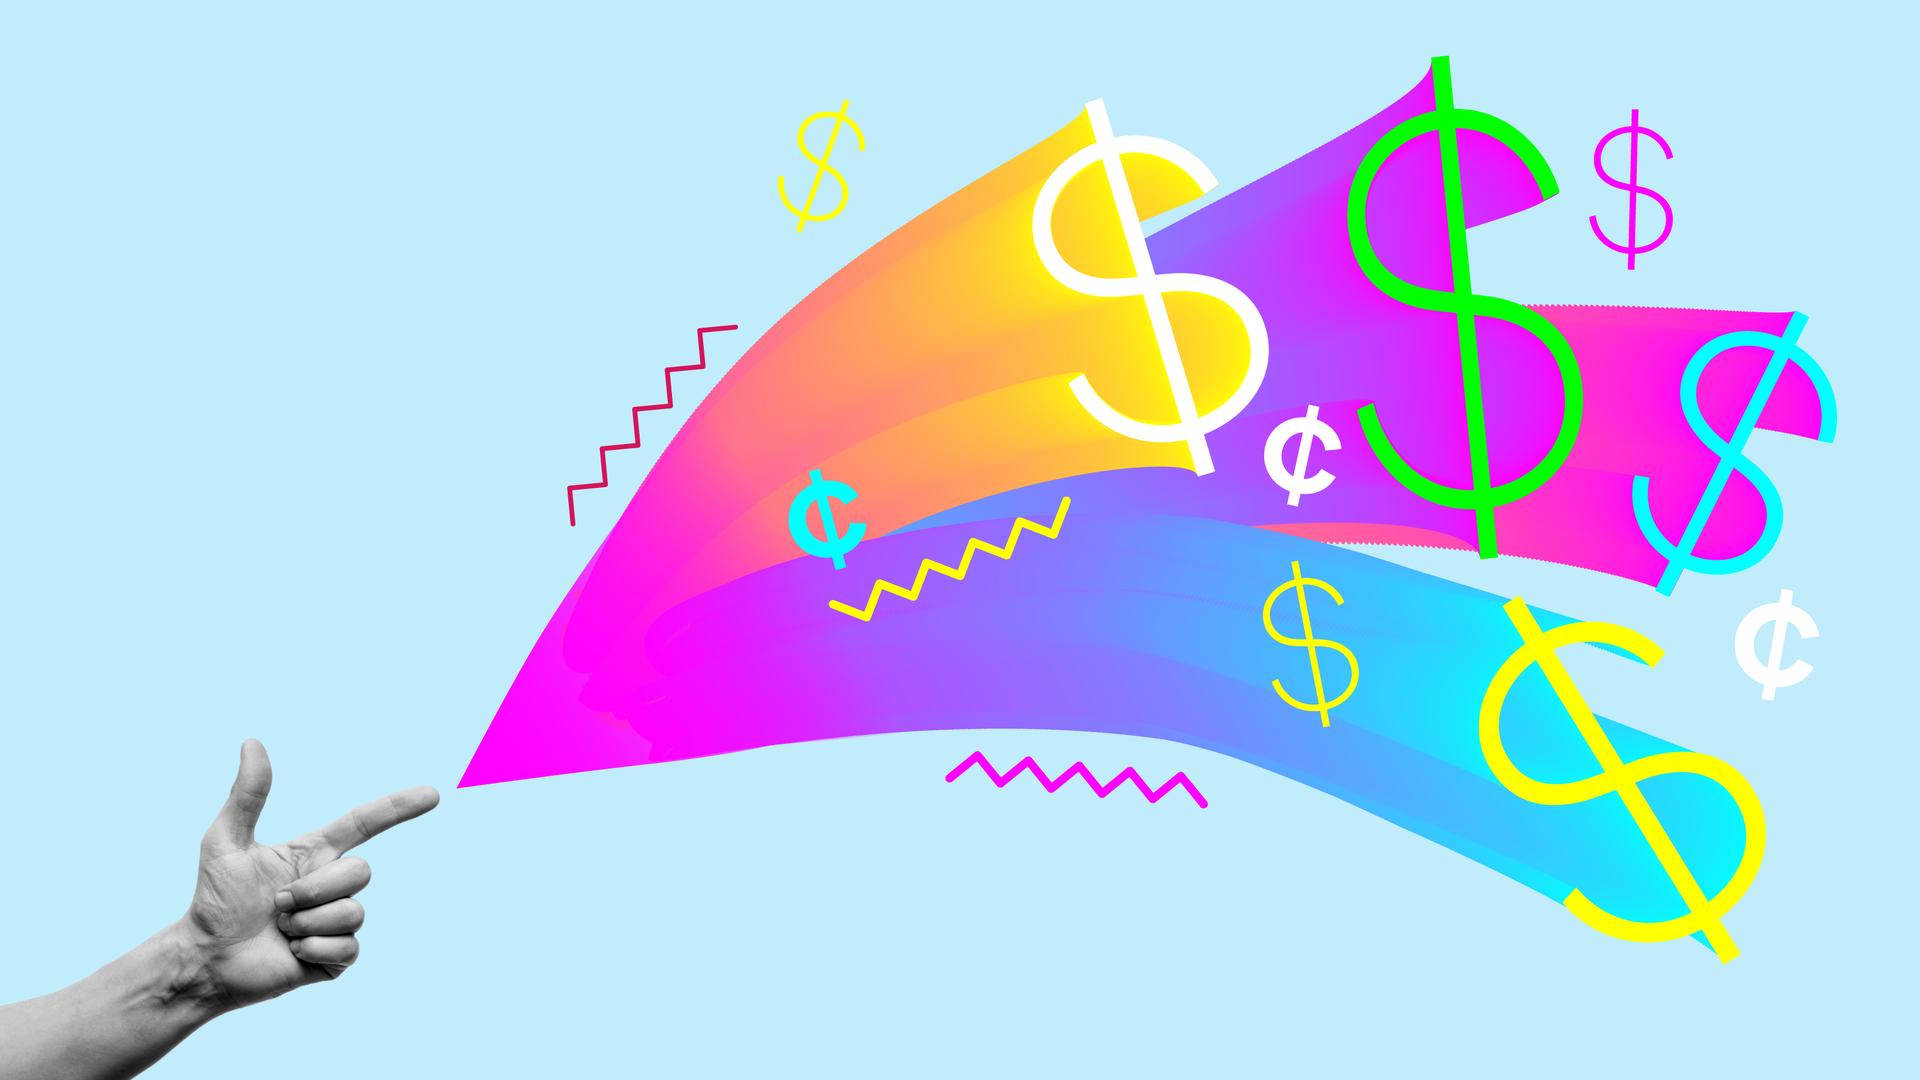 VC alternative Clearbanc raises $1 billion to fund startups